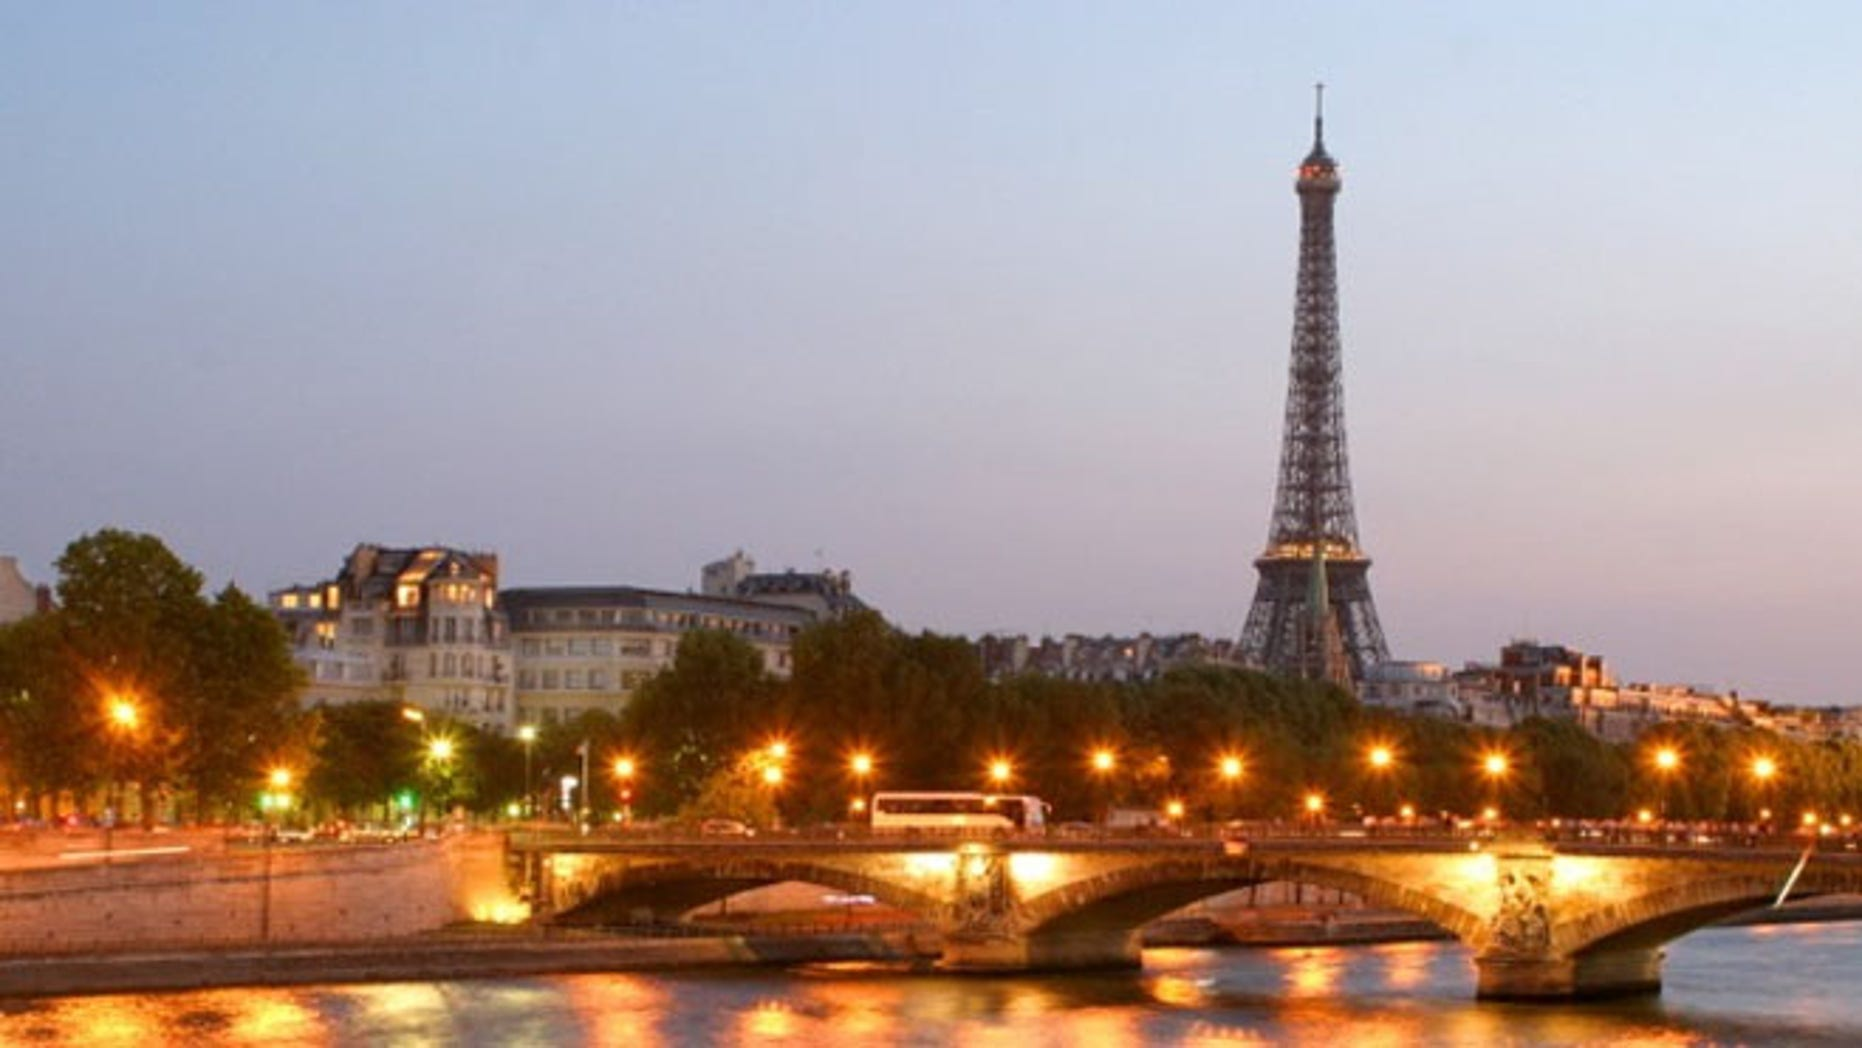 Paris' Eiffel Tower